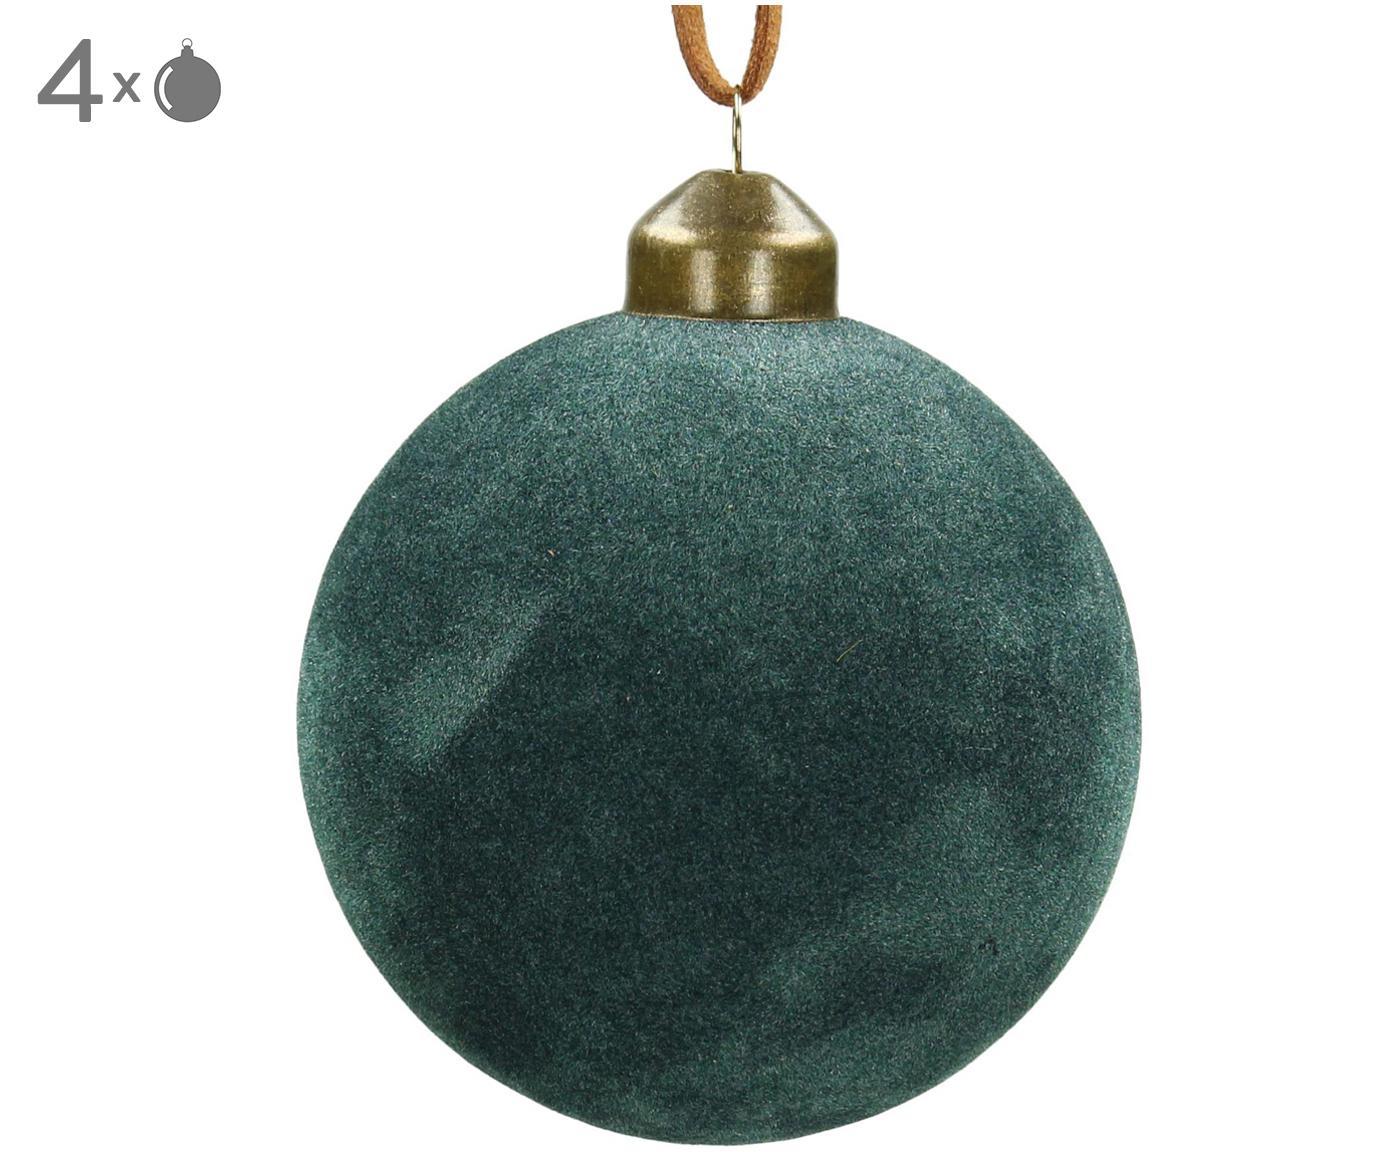 Palla di Natale Velvet, 4 pz., Vetro, velluto di poliestere, Blu verde, Ø 8 cm